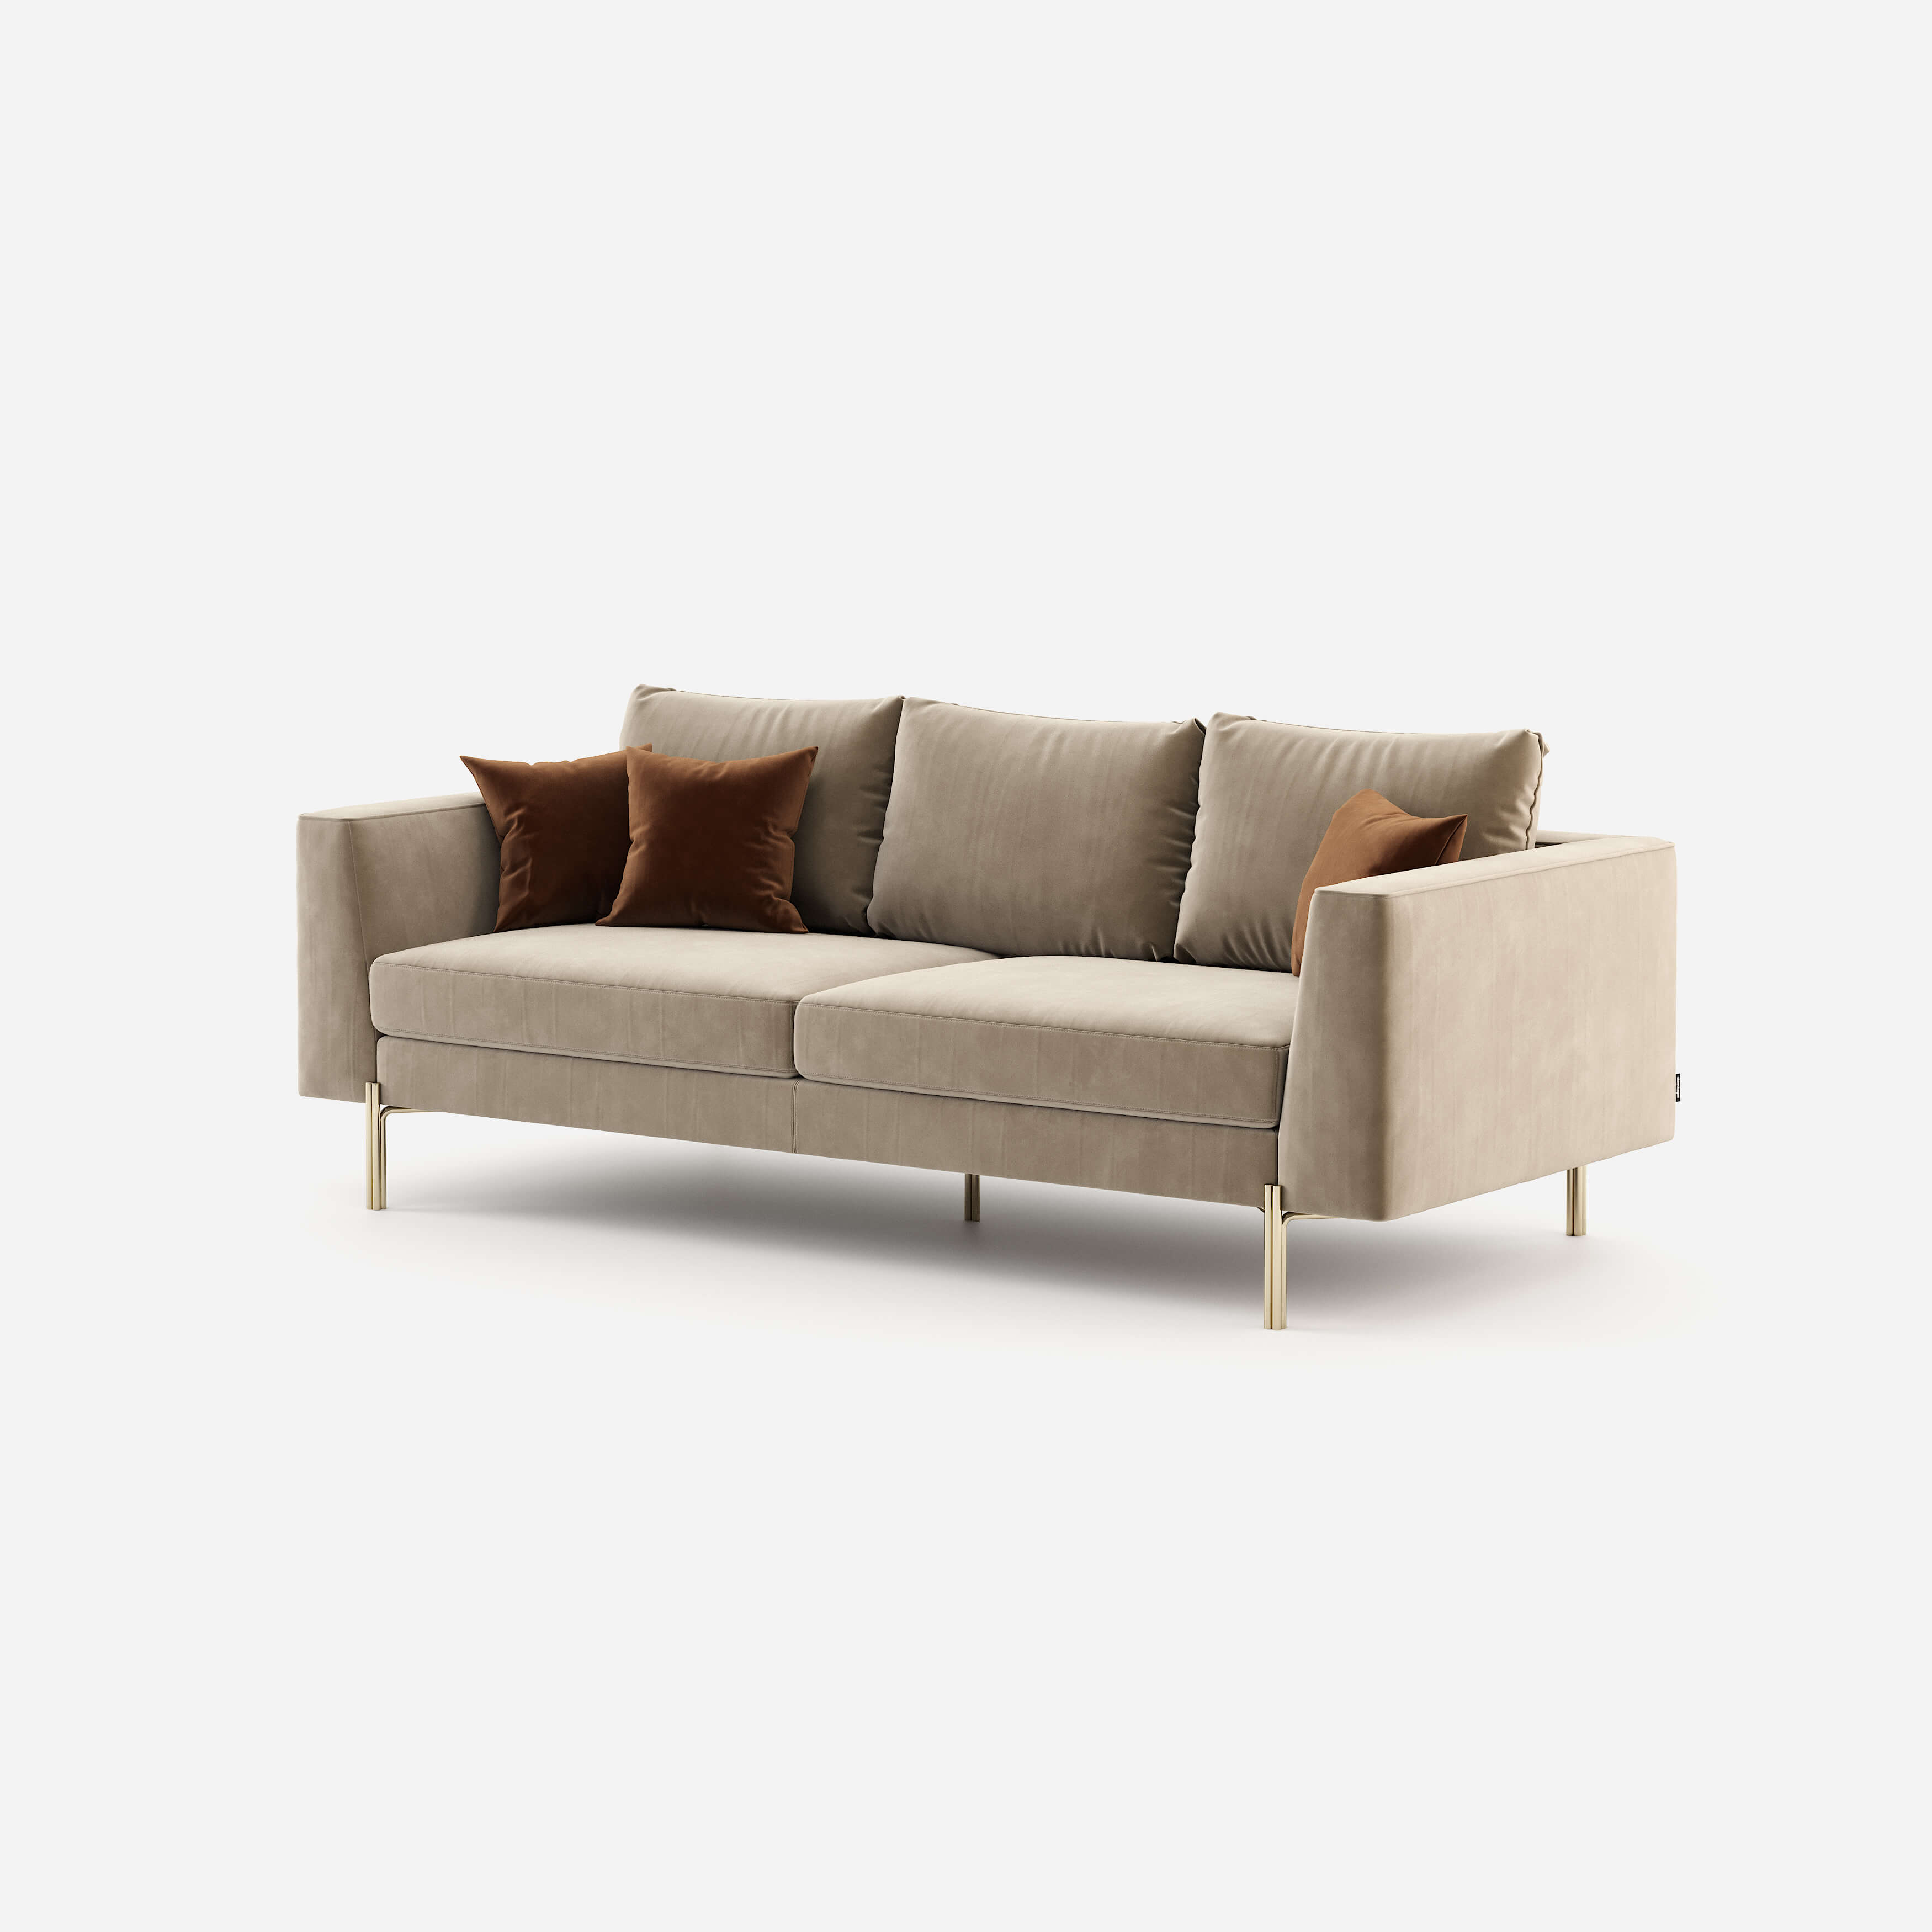 domkapa-blog-nicole-sofa-3l-2300x1030x880-3l-siege-0043-dove-_inox-dourado